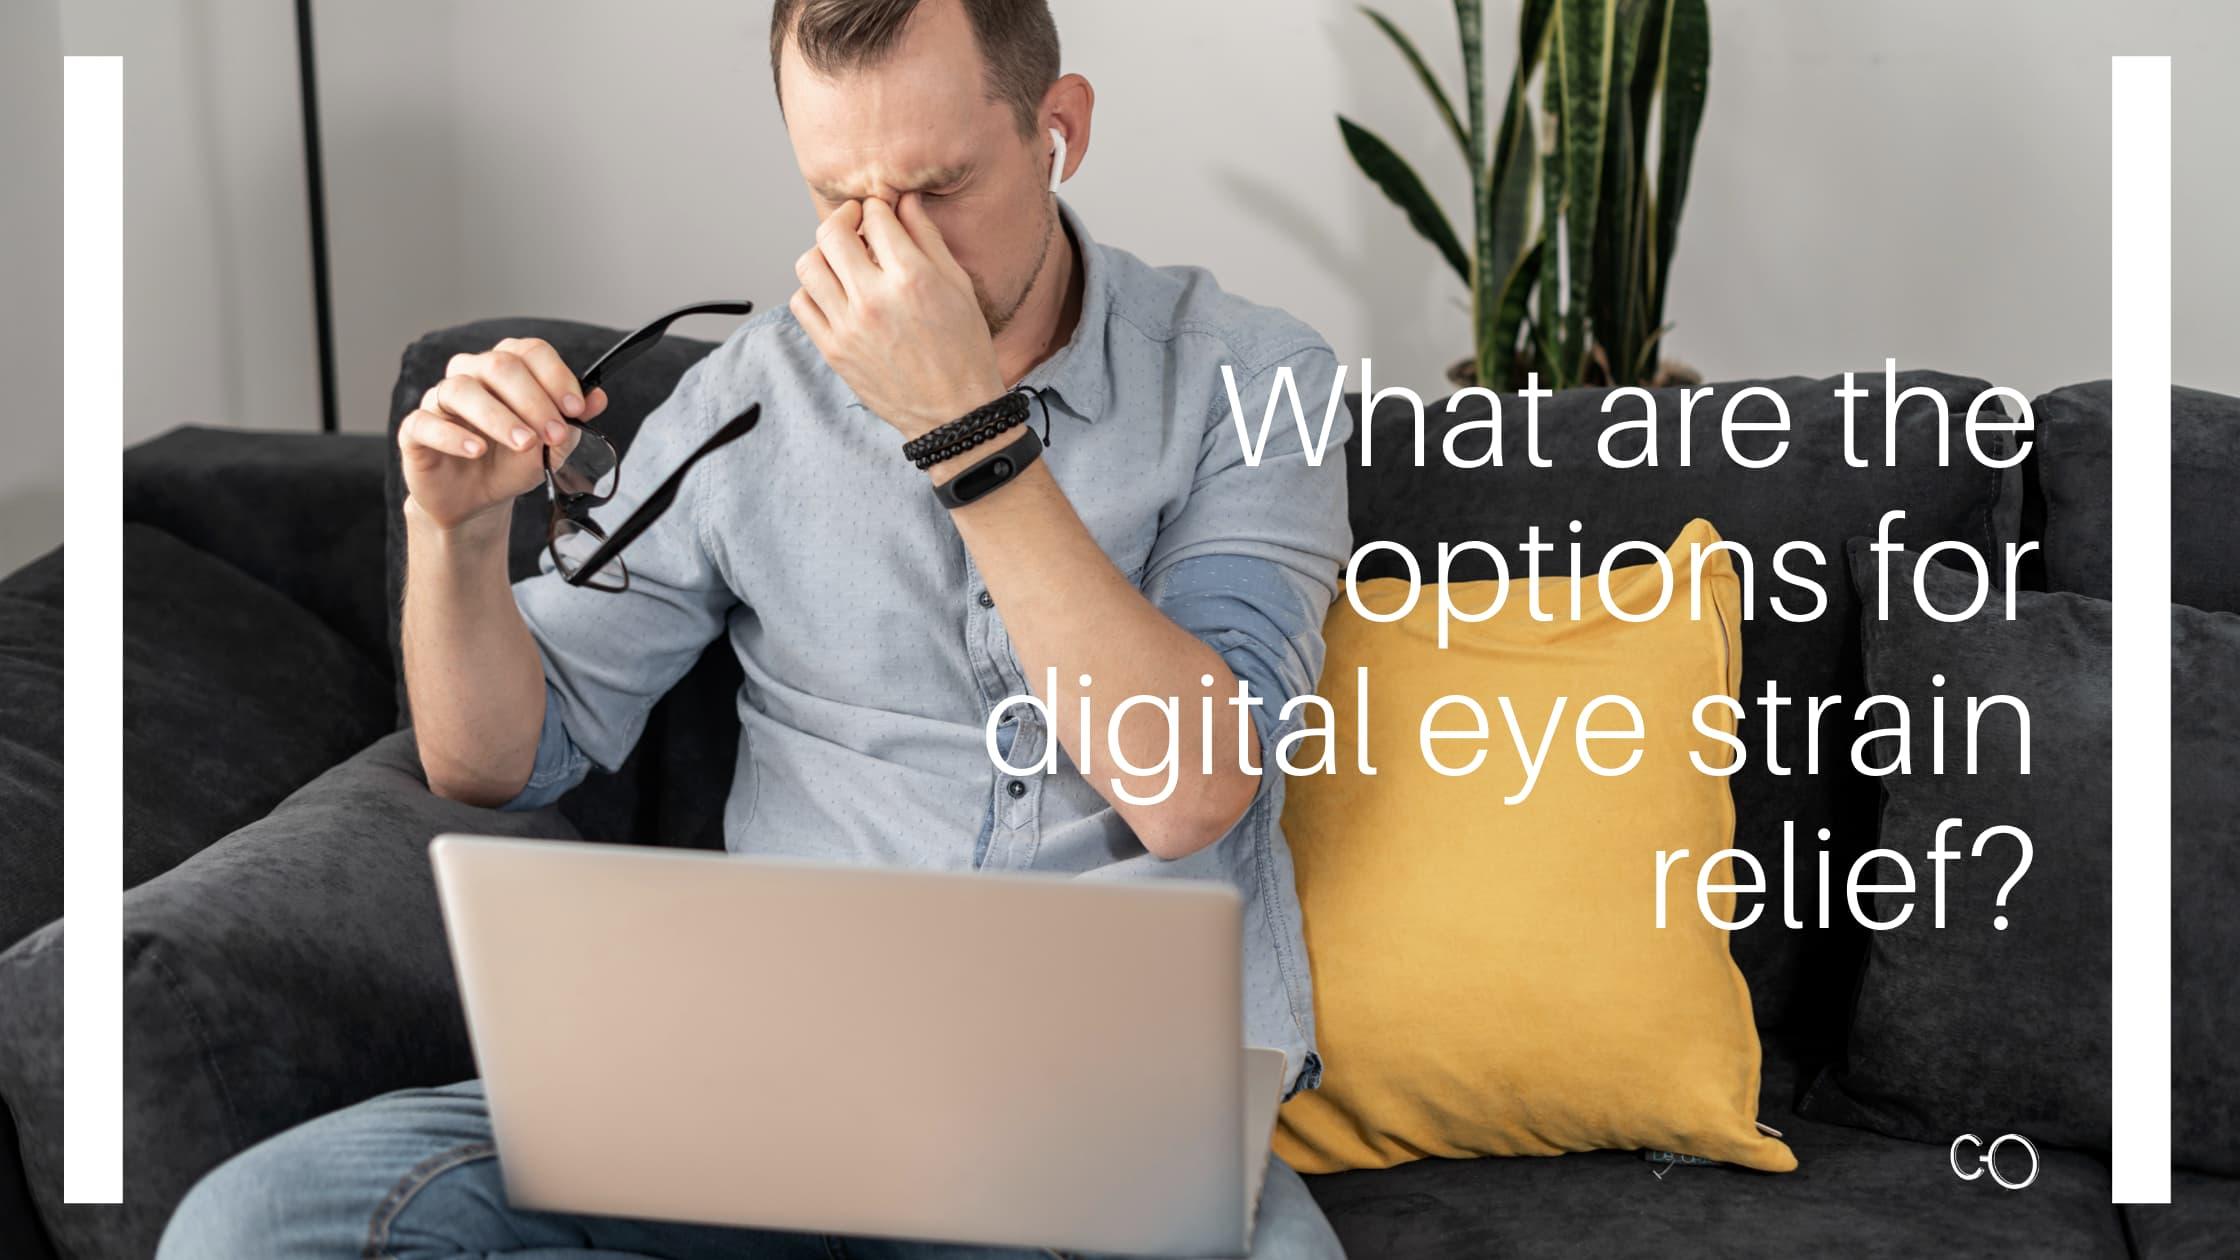 Options for digital eye strain relief